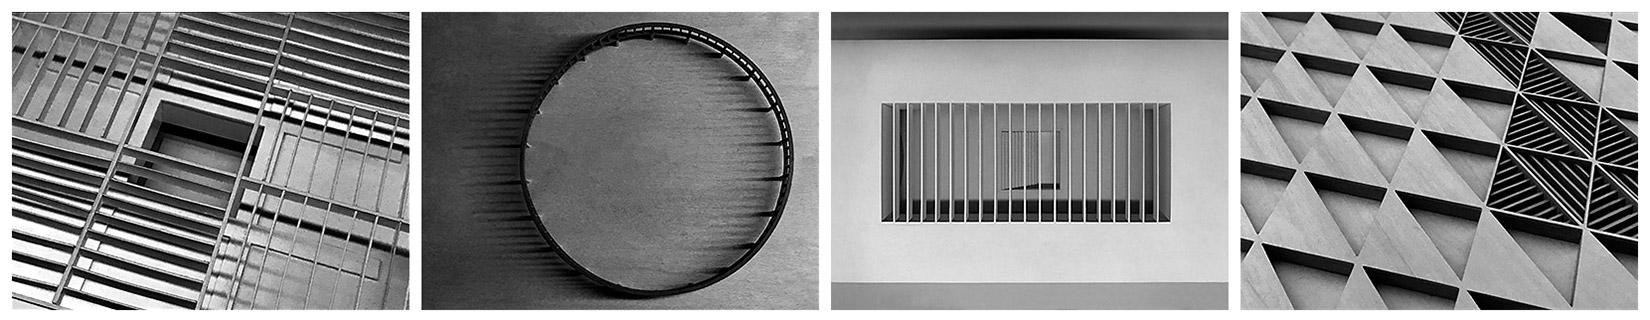 Museo ICO, Madrid Cruz y Ortiz 1/200.........................1/2000